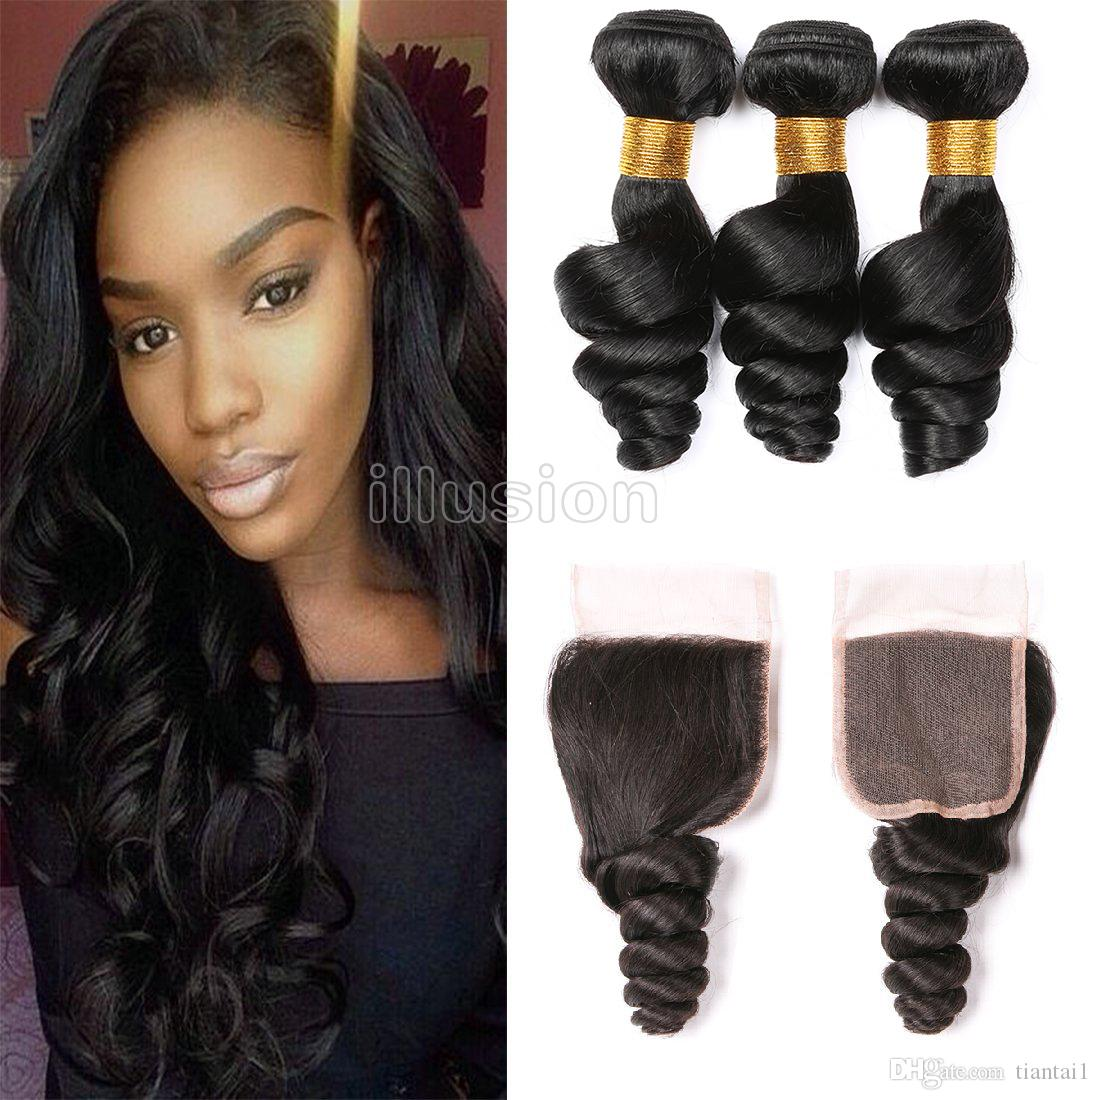 100 Virgin Hair Human Hair Extensions 3 Bundles With Lace Closure